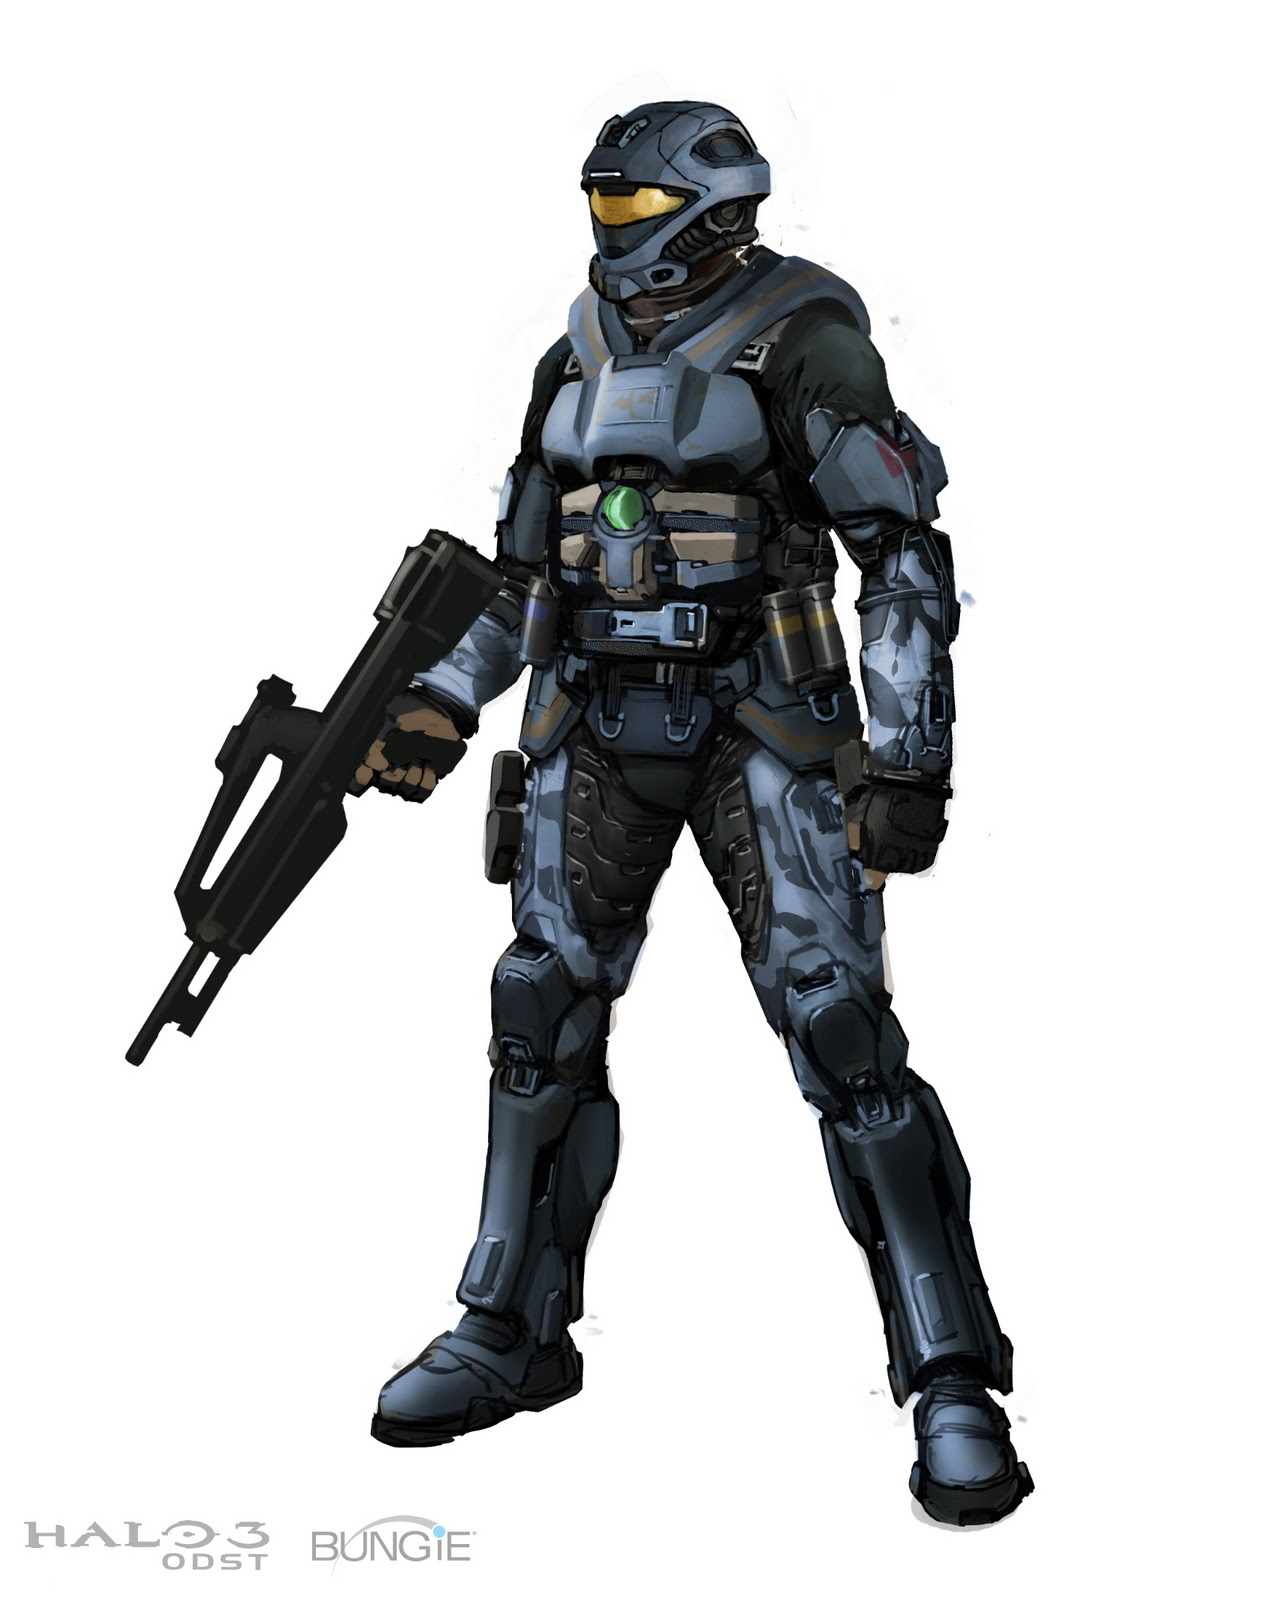 Halo Waypoint: Halo 3 ODST